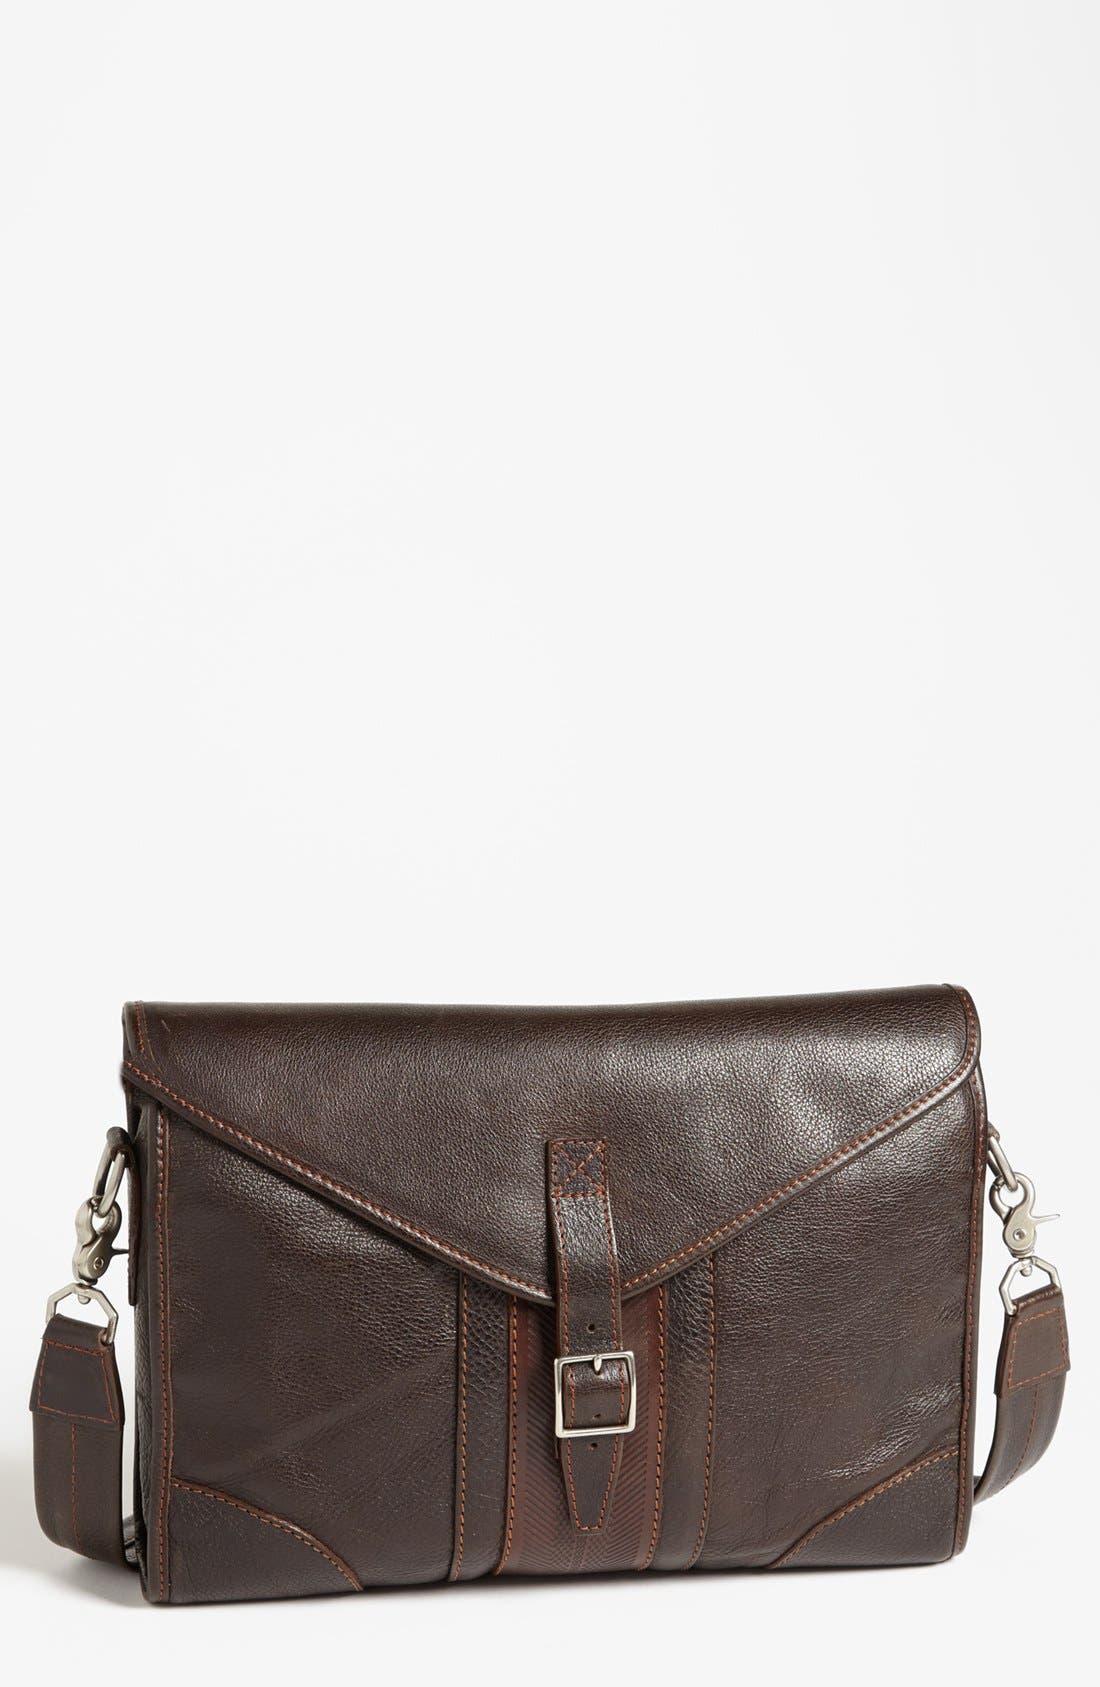 Alternate Image 1 Selected - Martin Dingman 'Rudyard - Billet' Messenger Bag